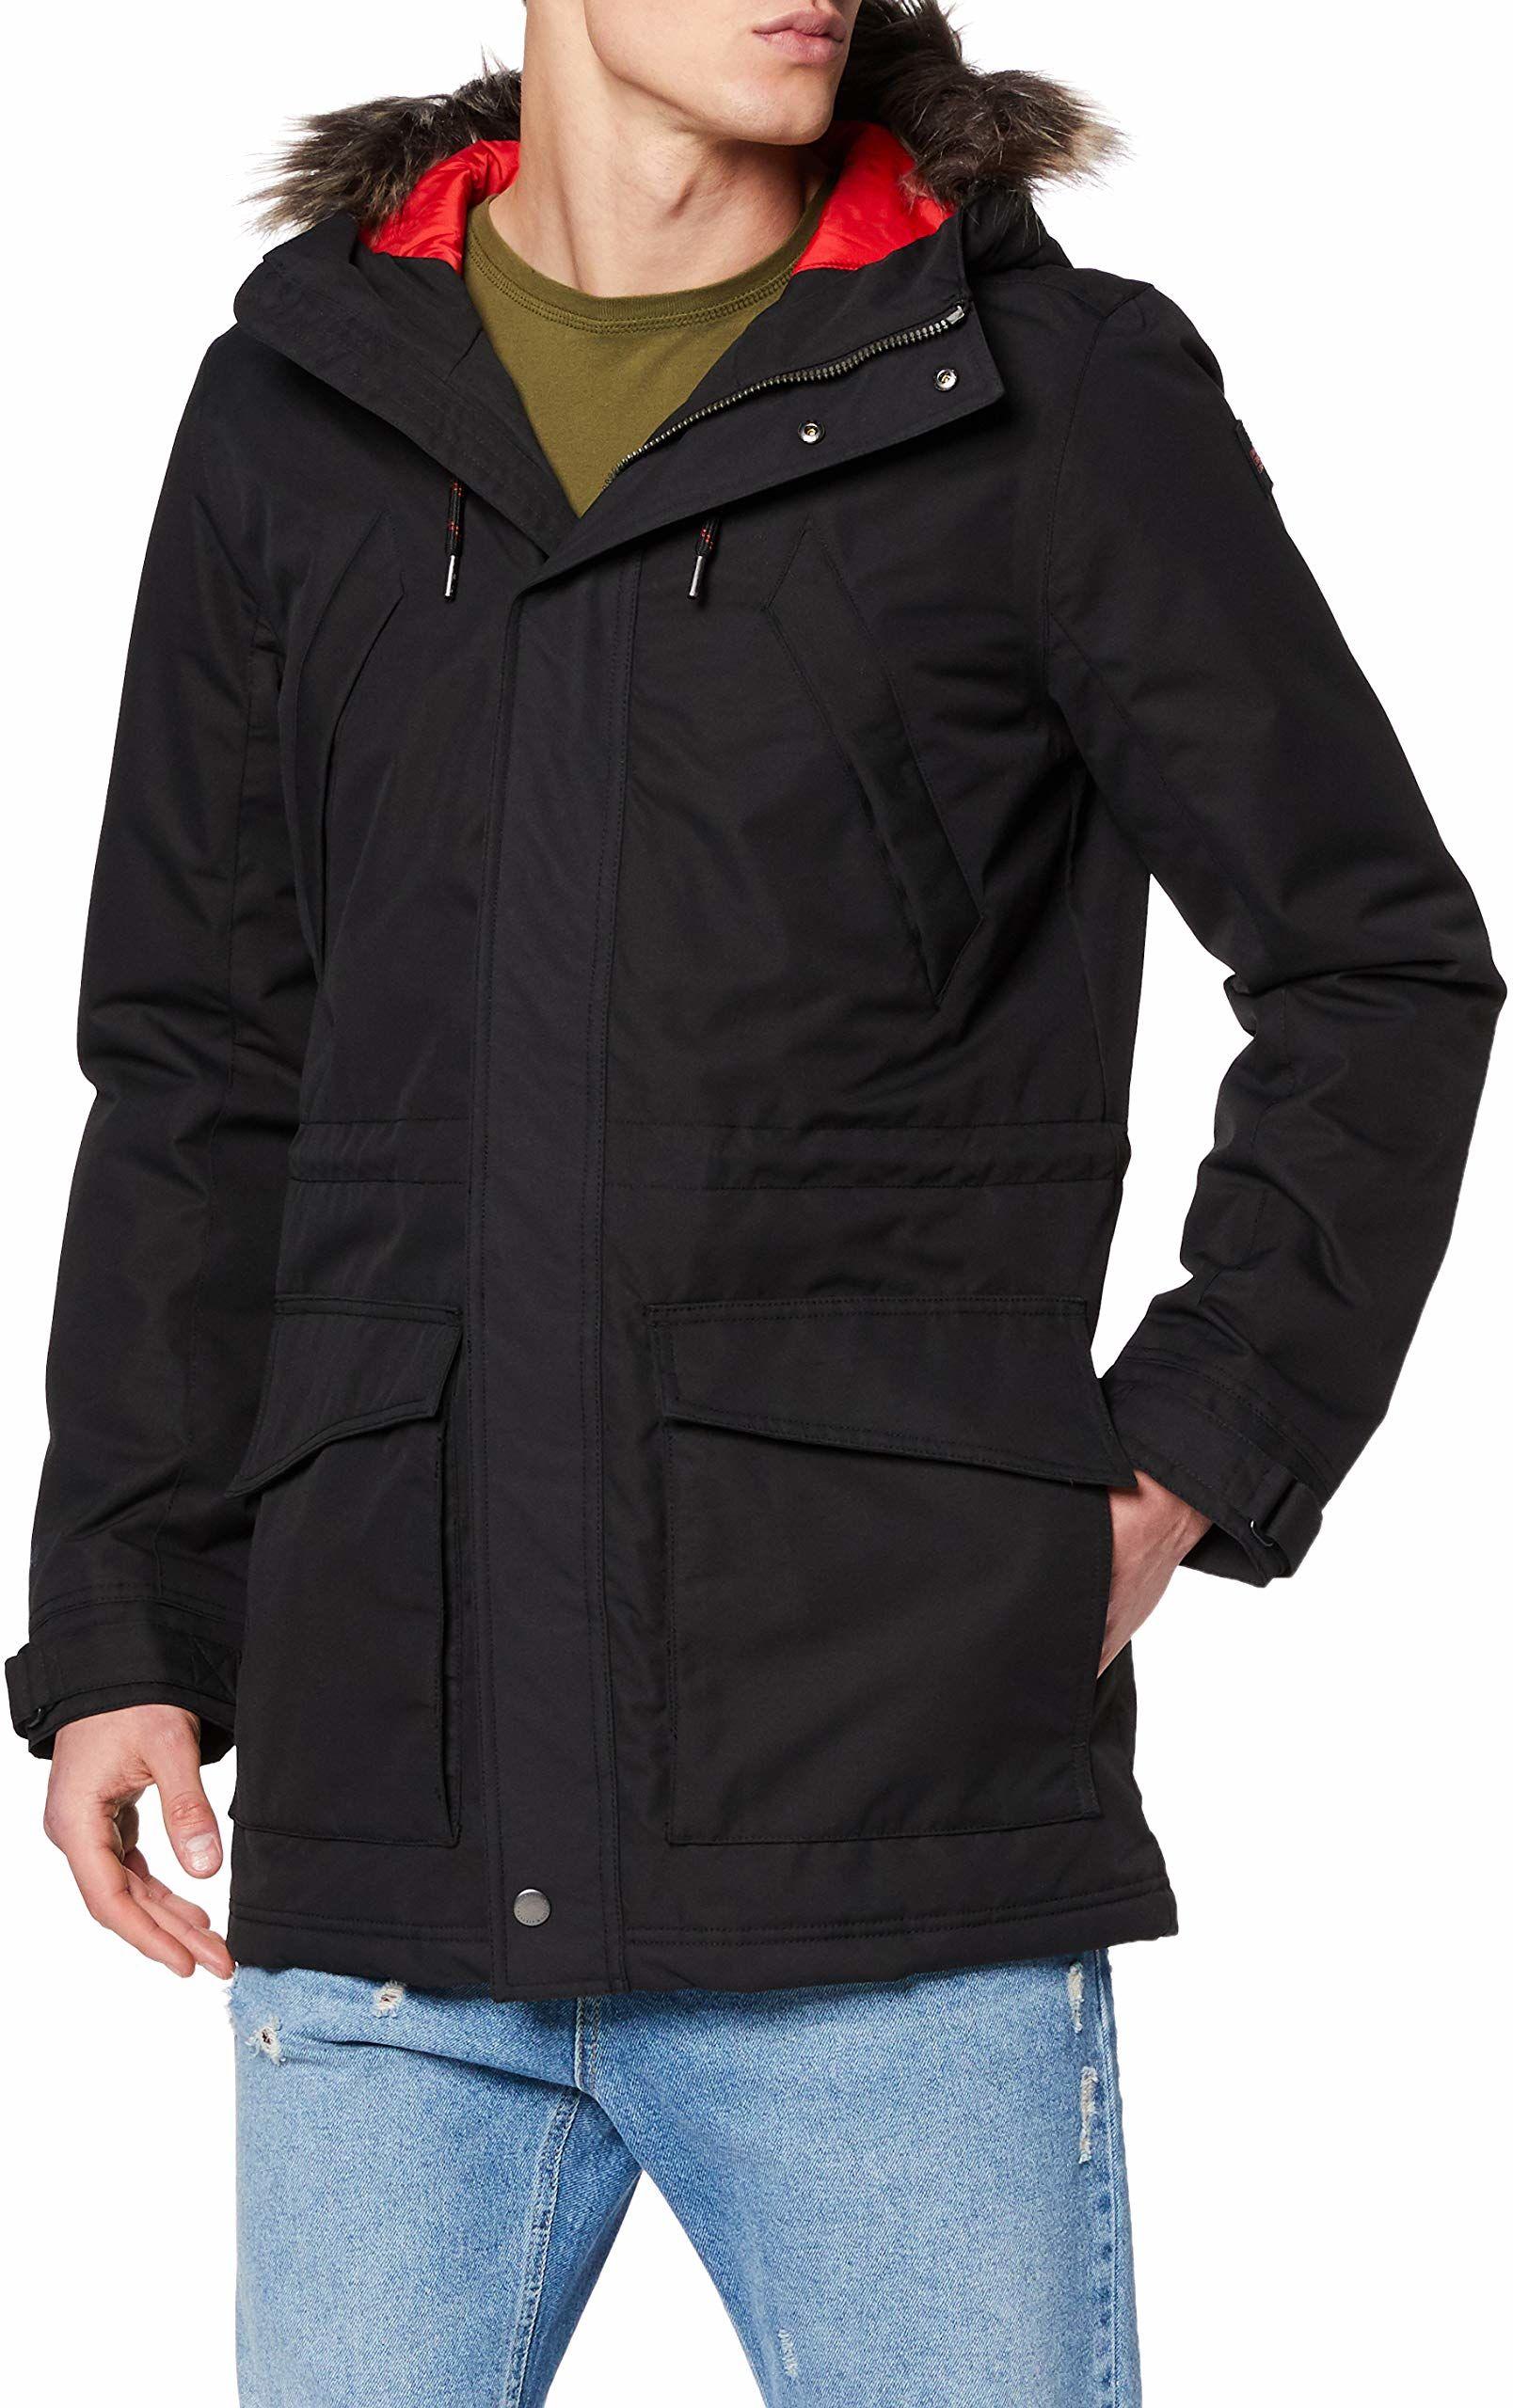 O''Neill LM FLINT CANVAS PARKA Jackets Technical, Black Out, XL